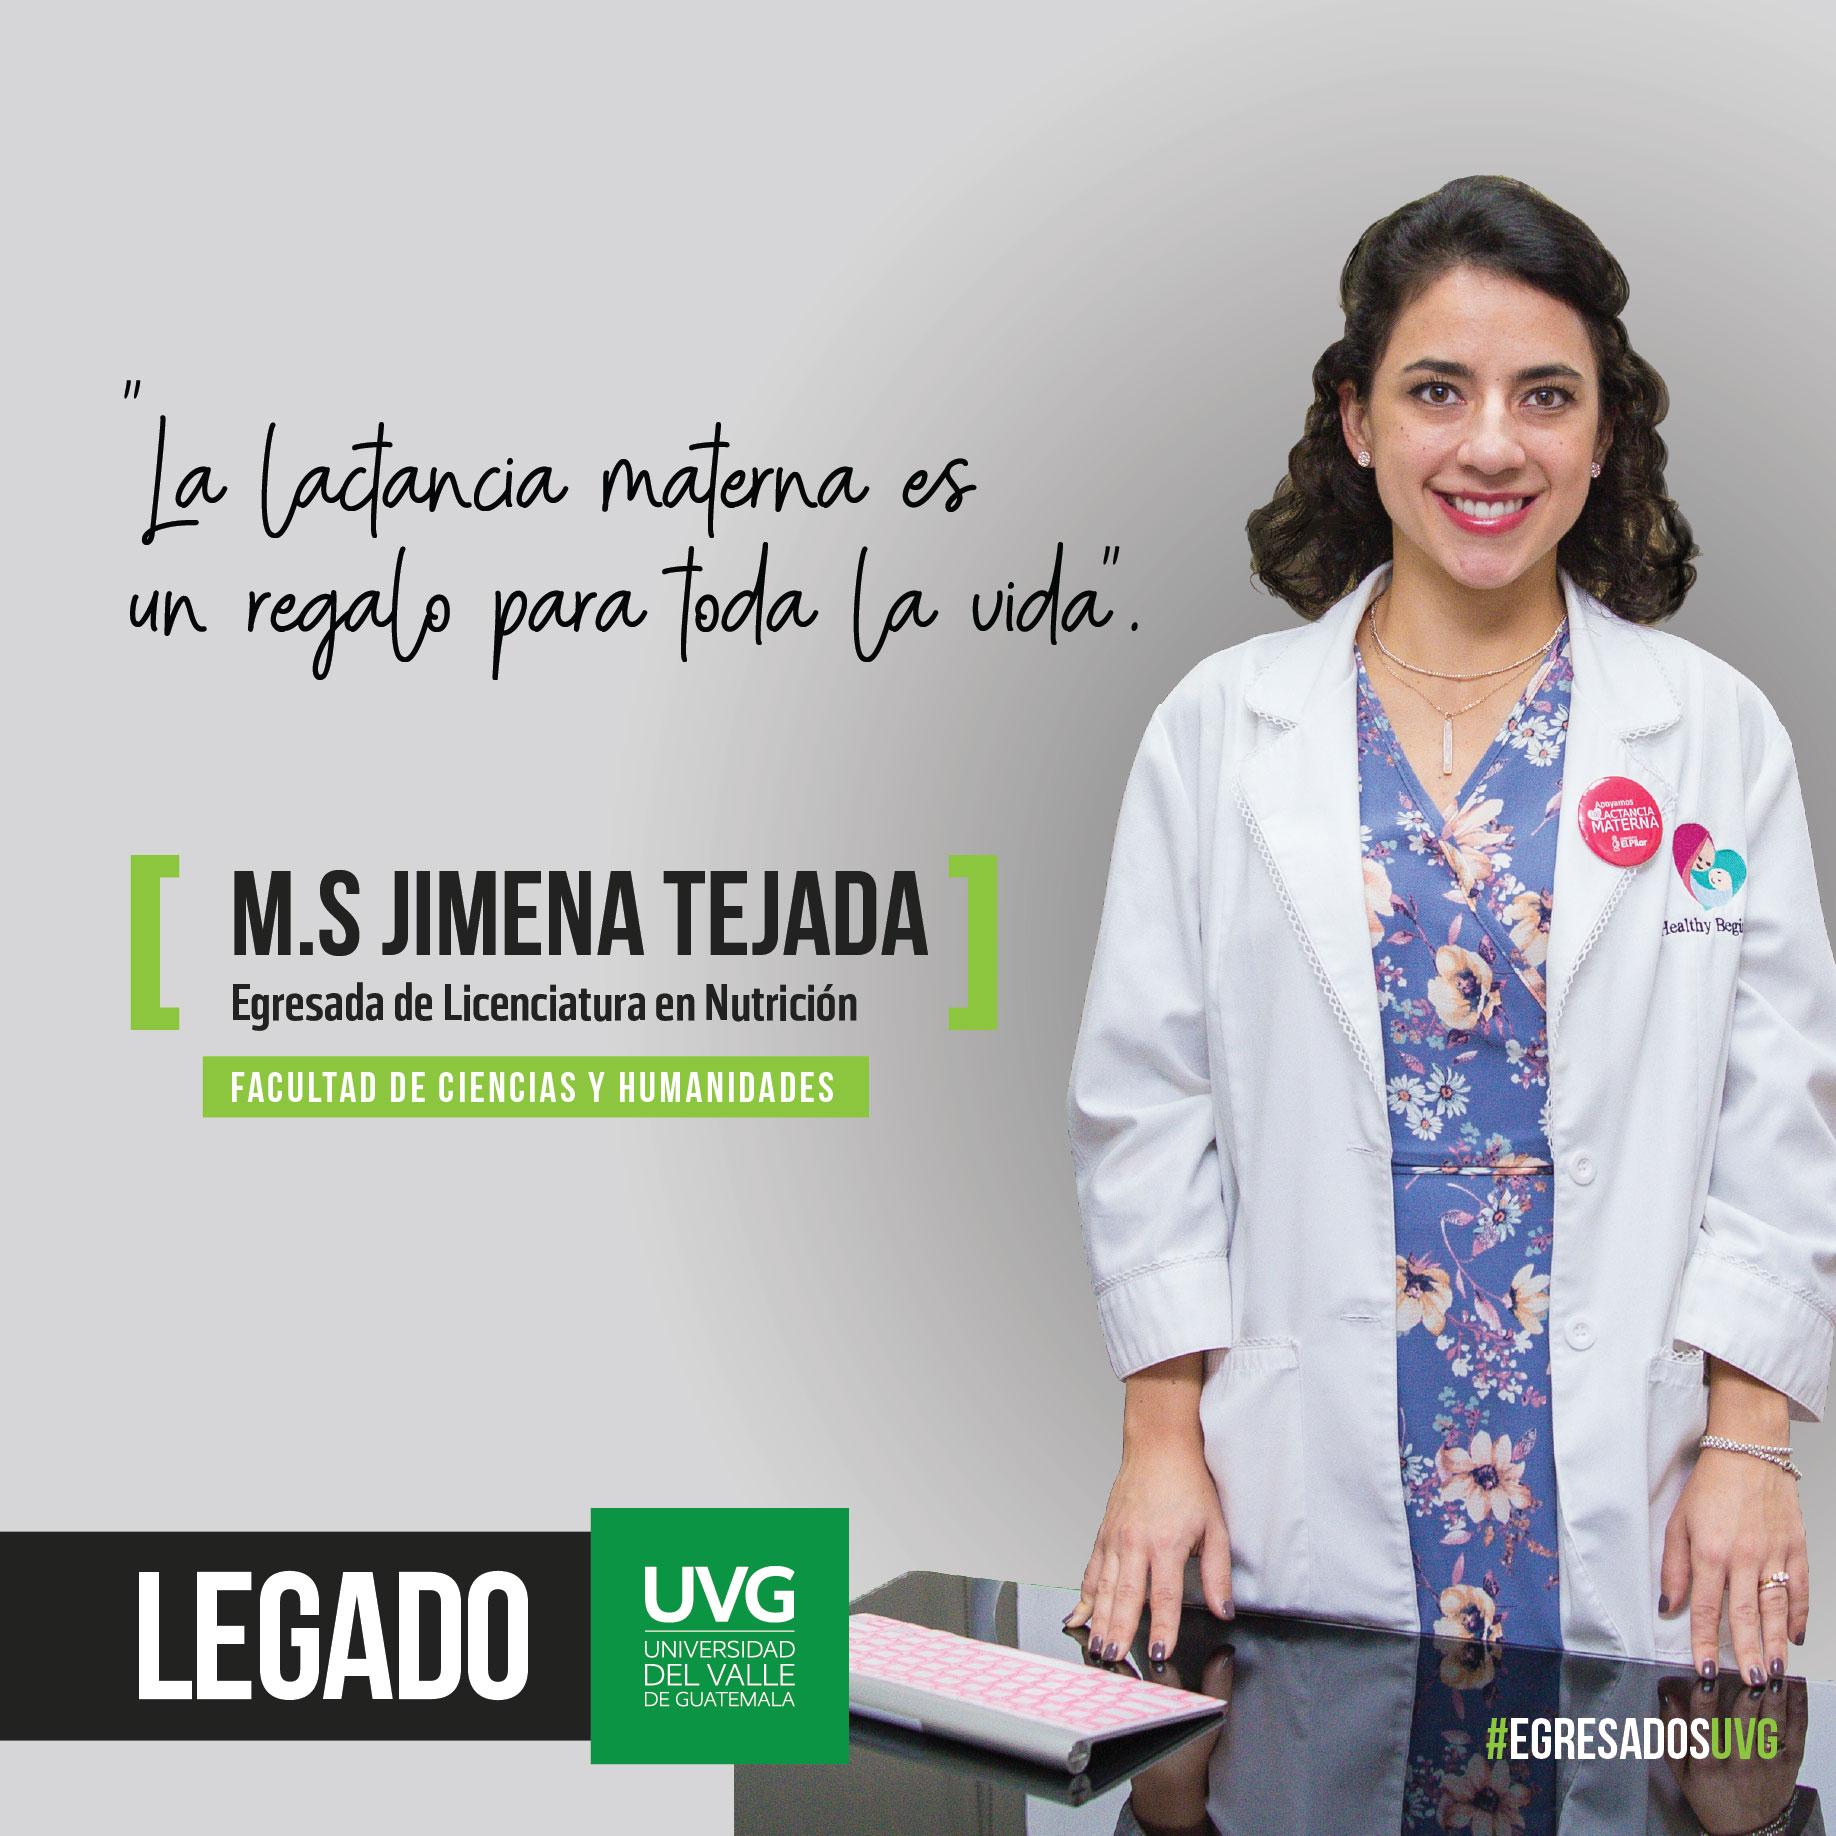 Legado UVG M.S Jimena Tejada